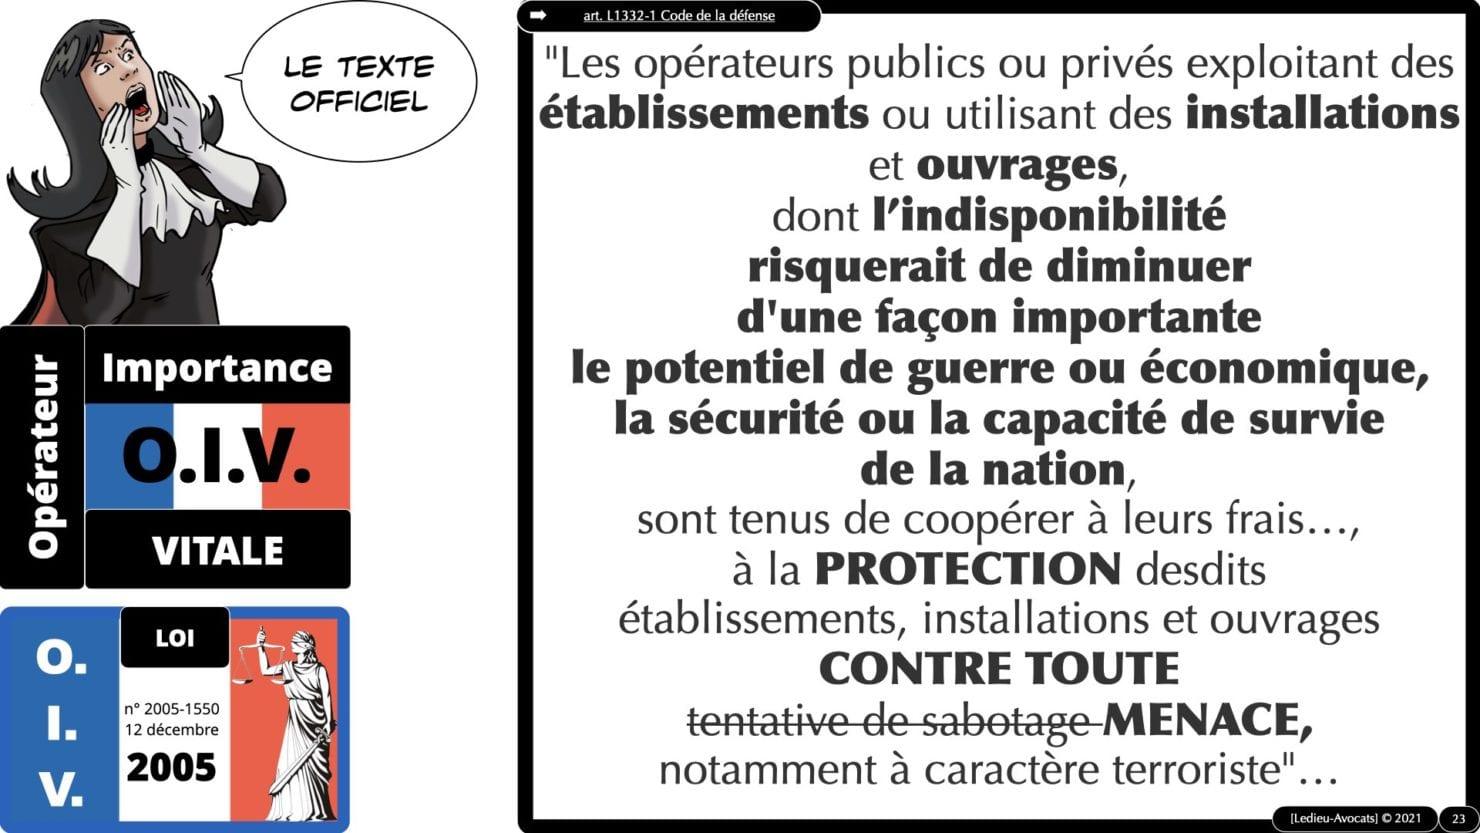 337 cyber sécurité #1 OIV OSE Critical Entities © Ledieu-avocat 15-06-2021.023